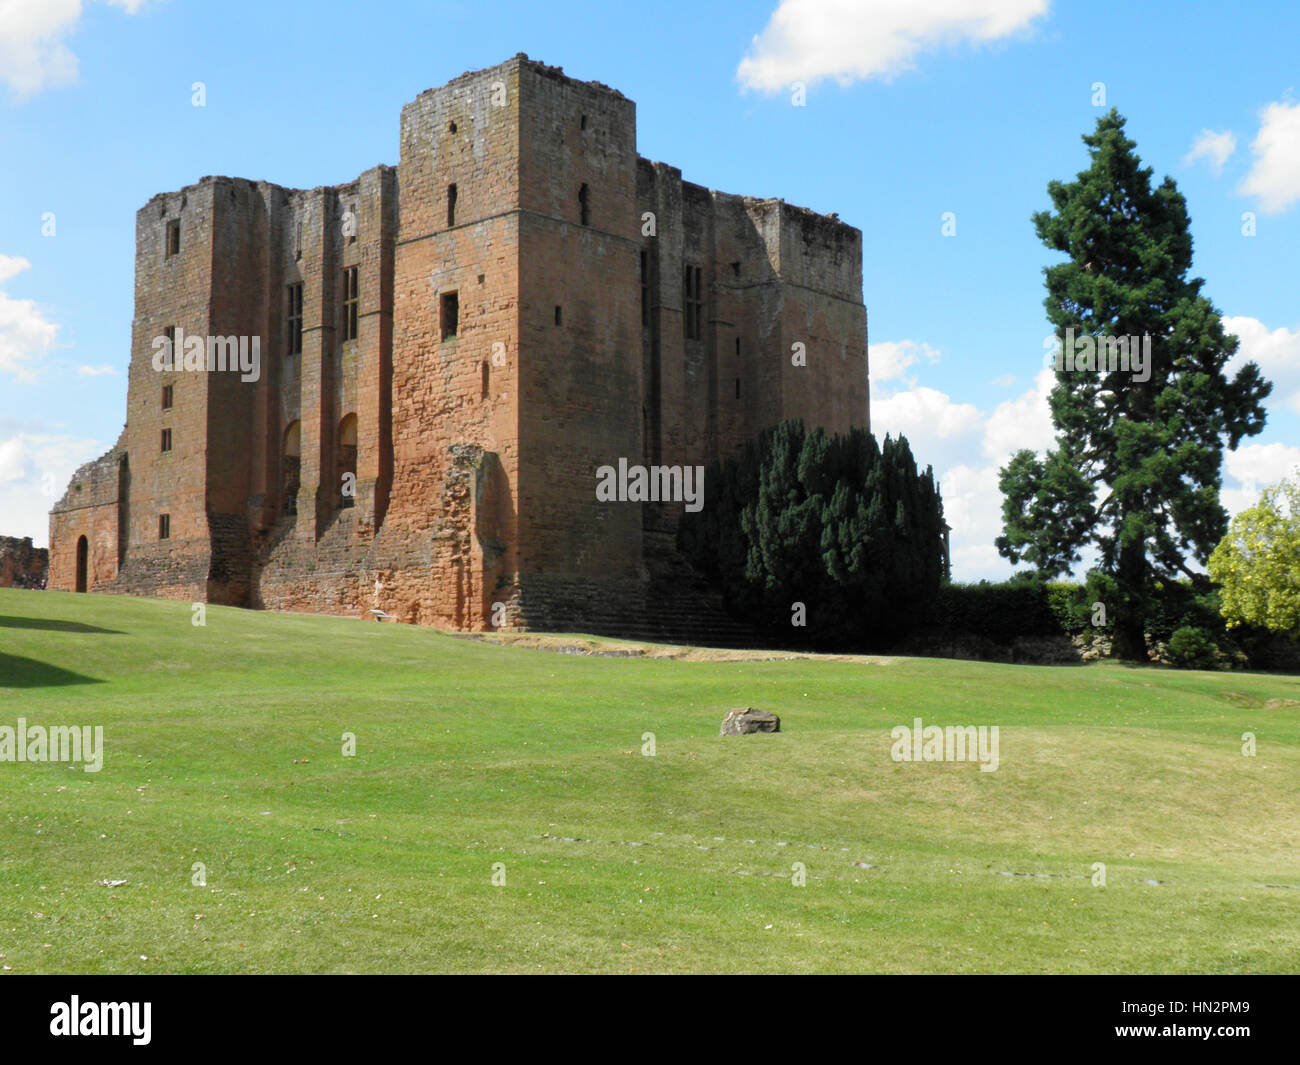 Kenilworth Castle - Stock Image